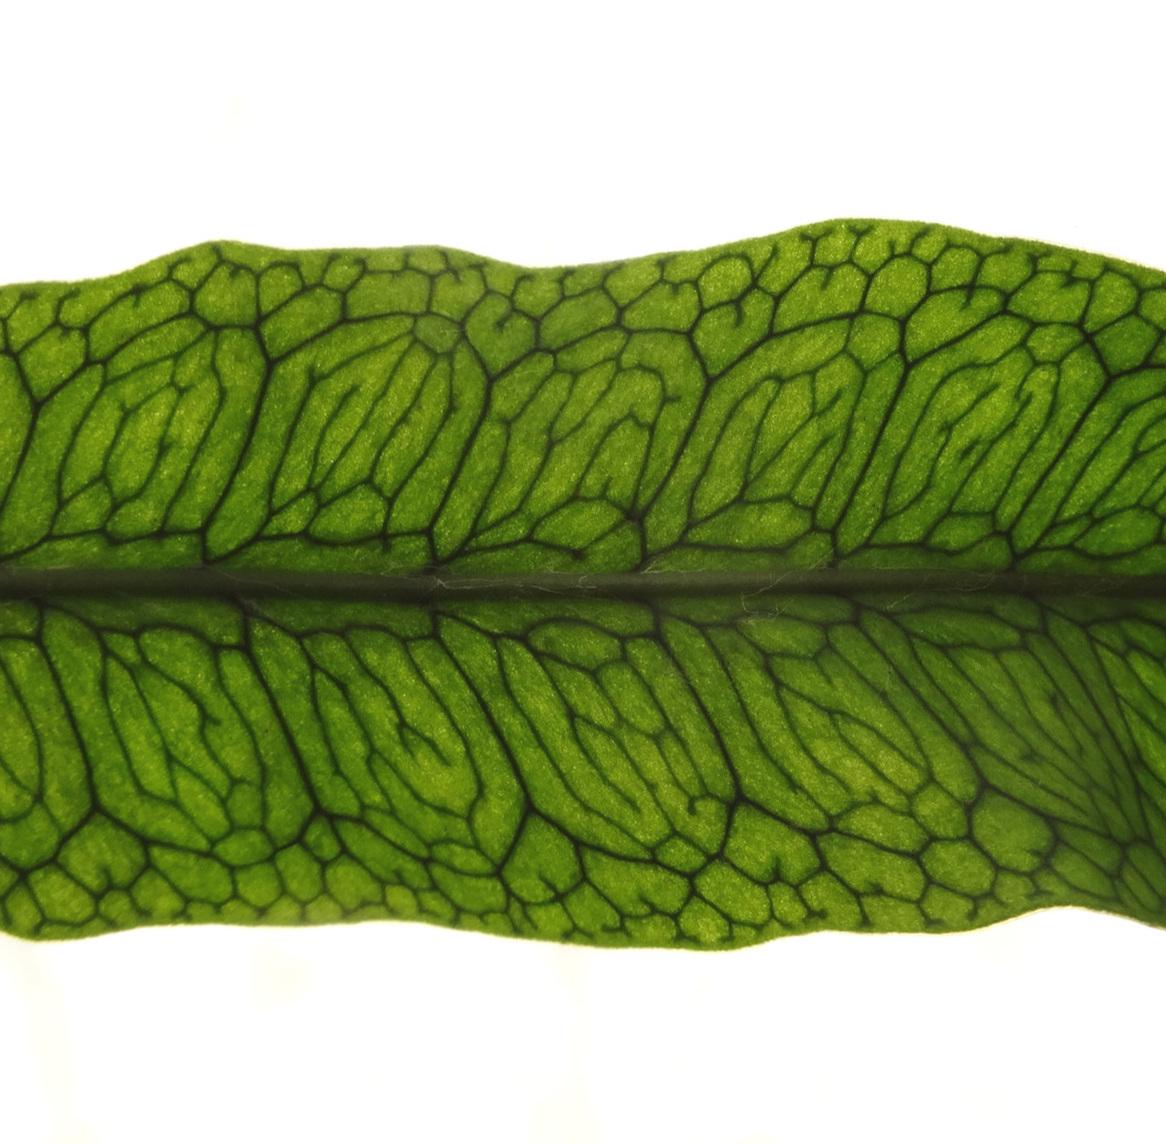 Microgramma+squamulosa+frond+detail.jpg